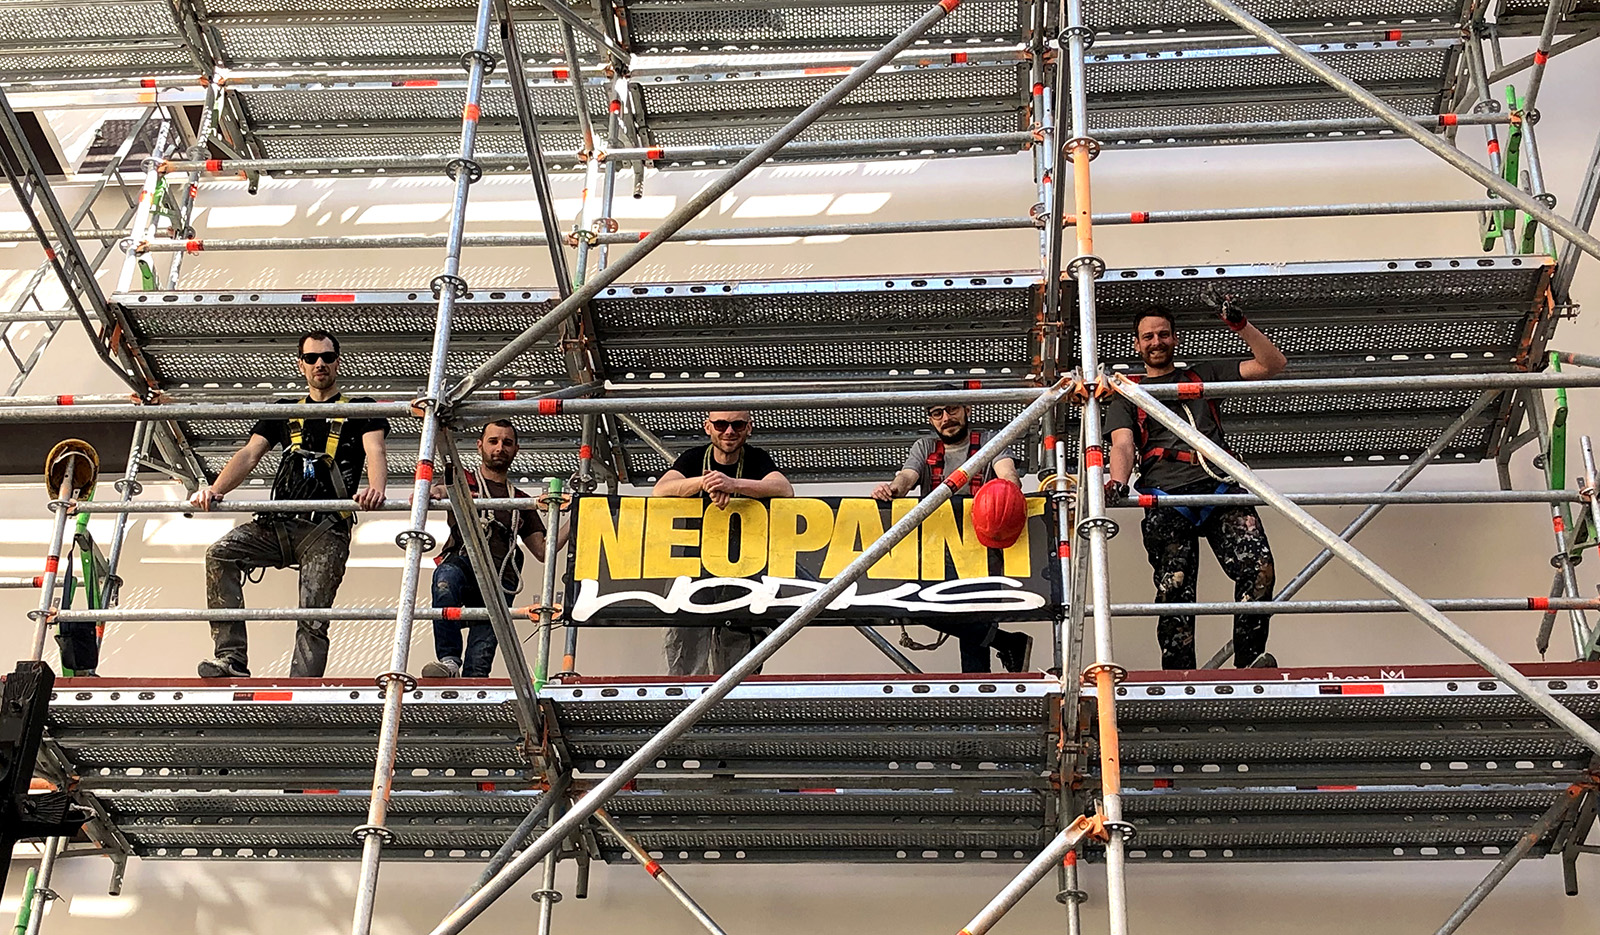 Tűzfalfestés - UNICEF Neopaint Works